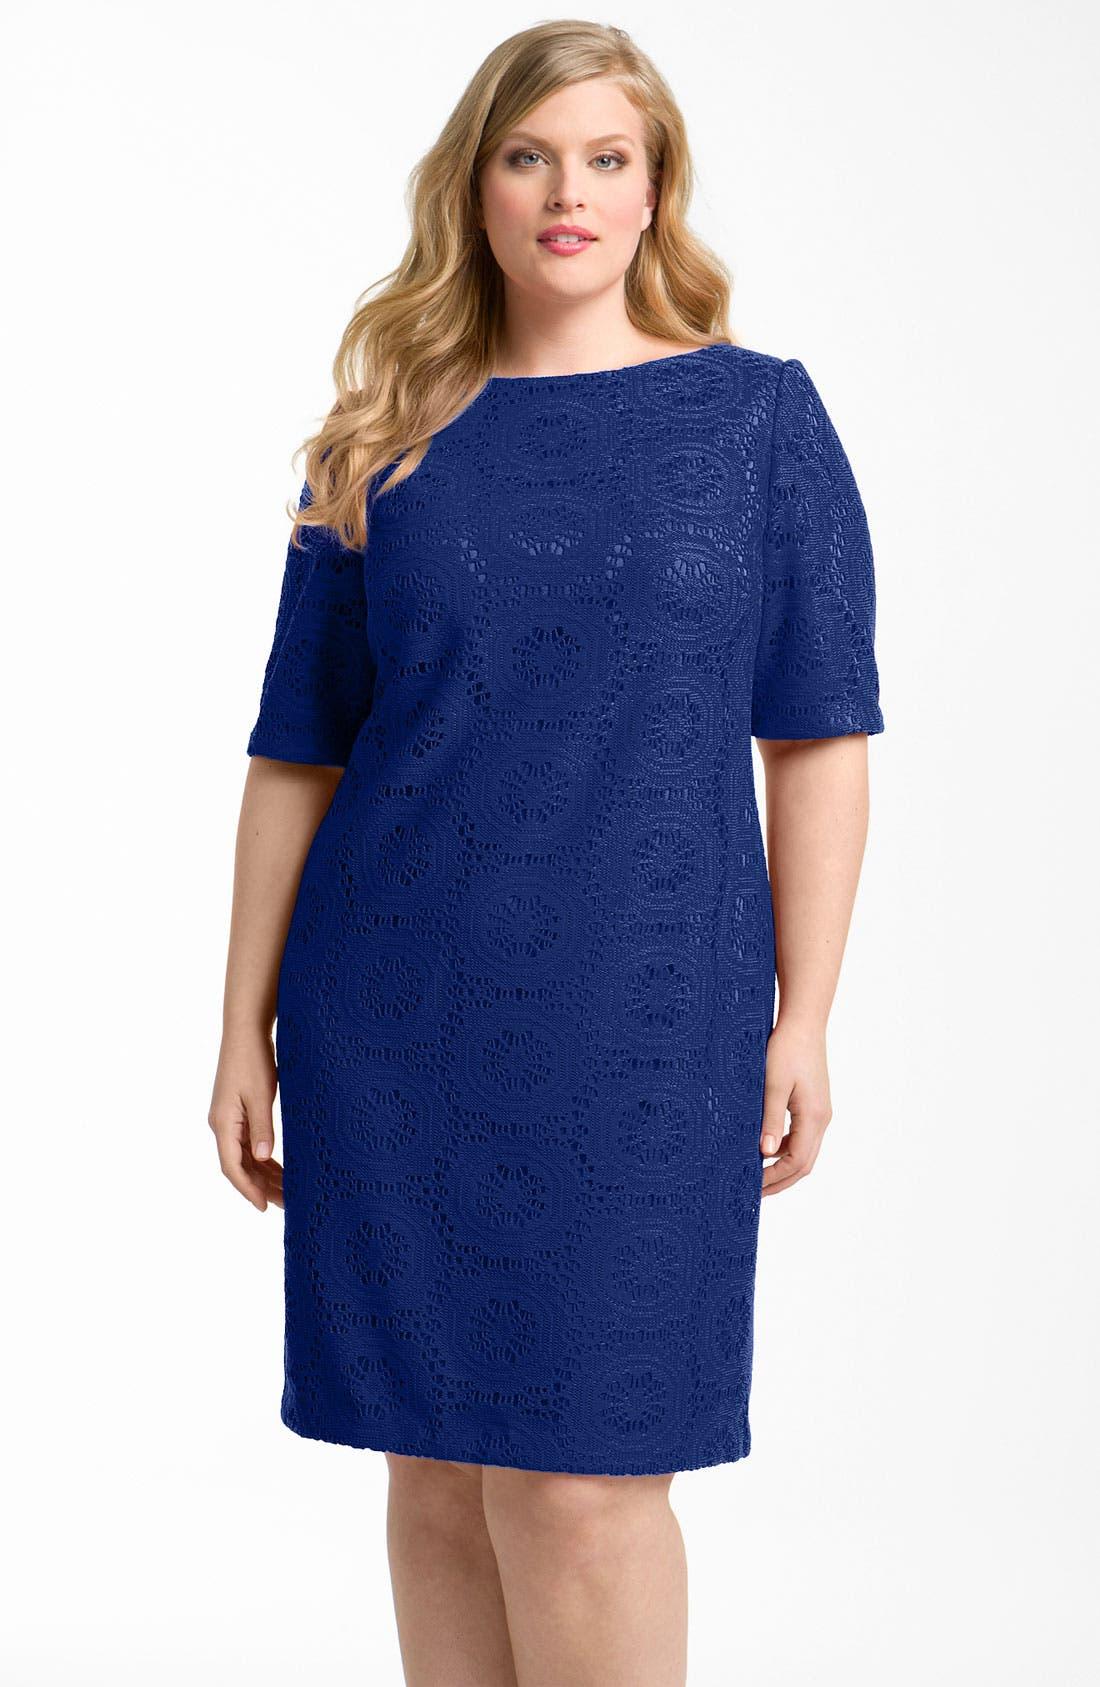 Main Image - Adrianna Papell Crochet Overlay Sheath Dress (Plus)